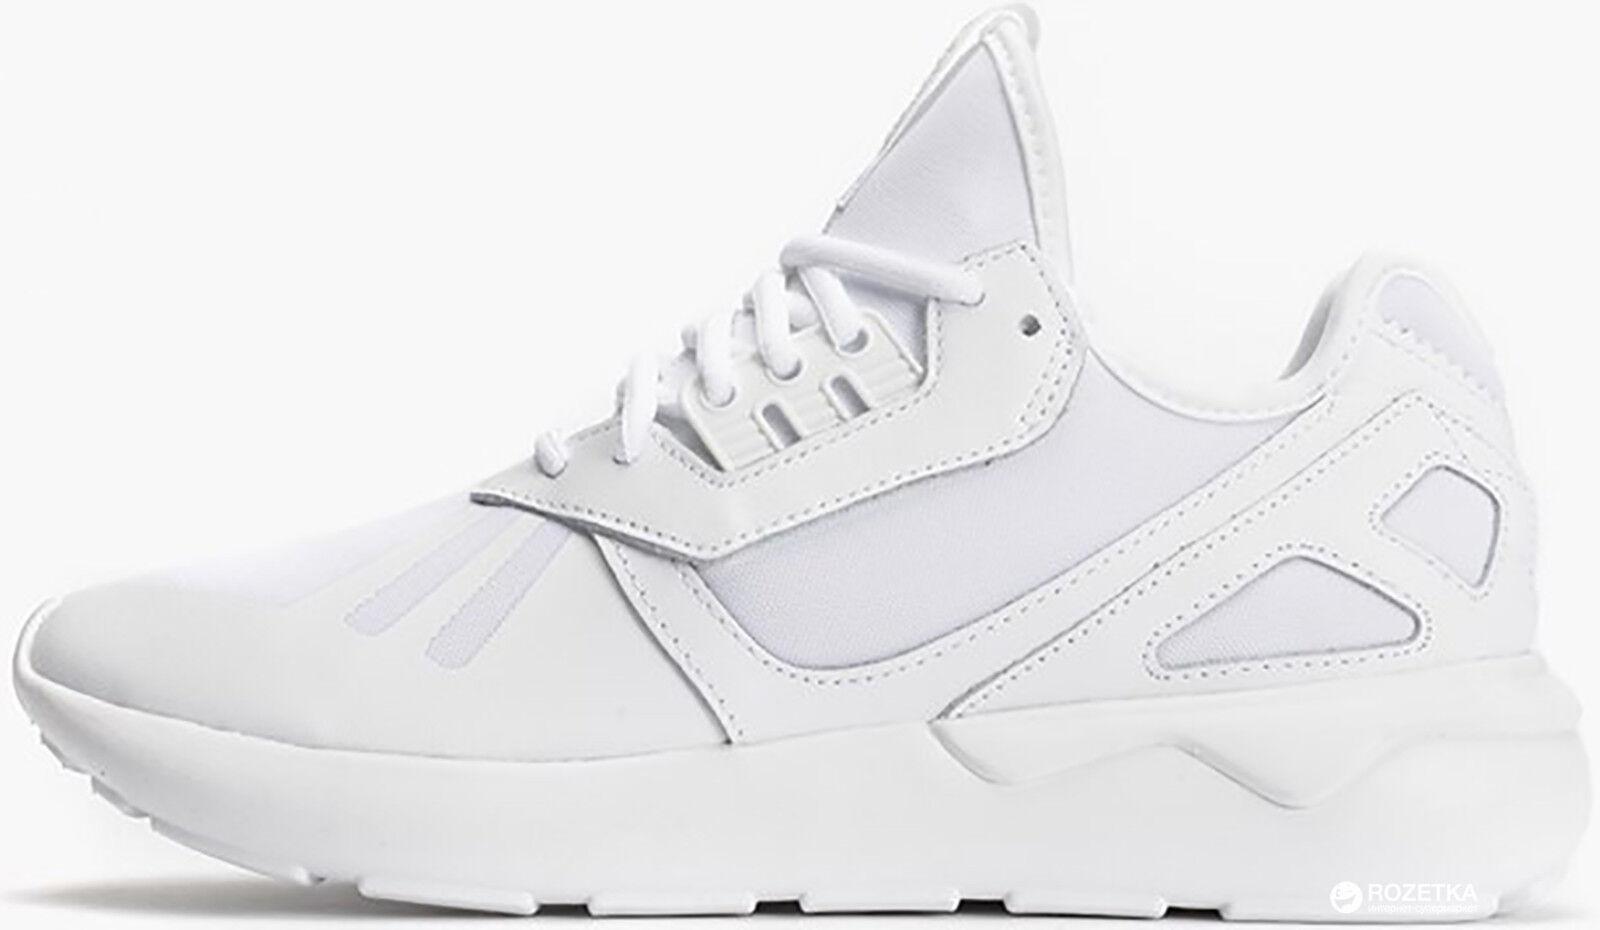 Adidas tubular Runner W nuevo gr 45 1 3 nuevo blanco blancoo b25087 cortos Originals